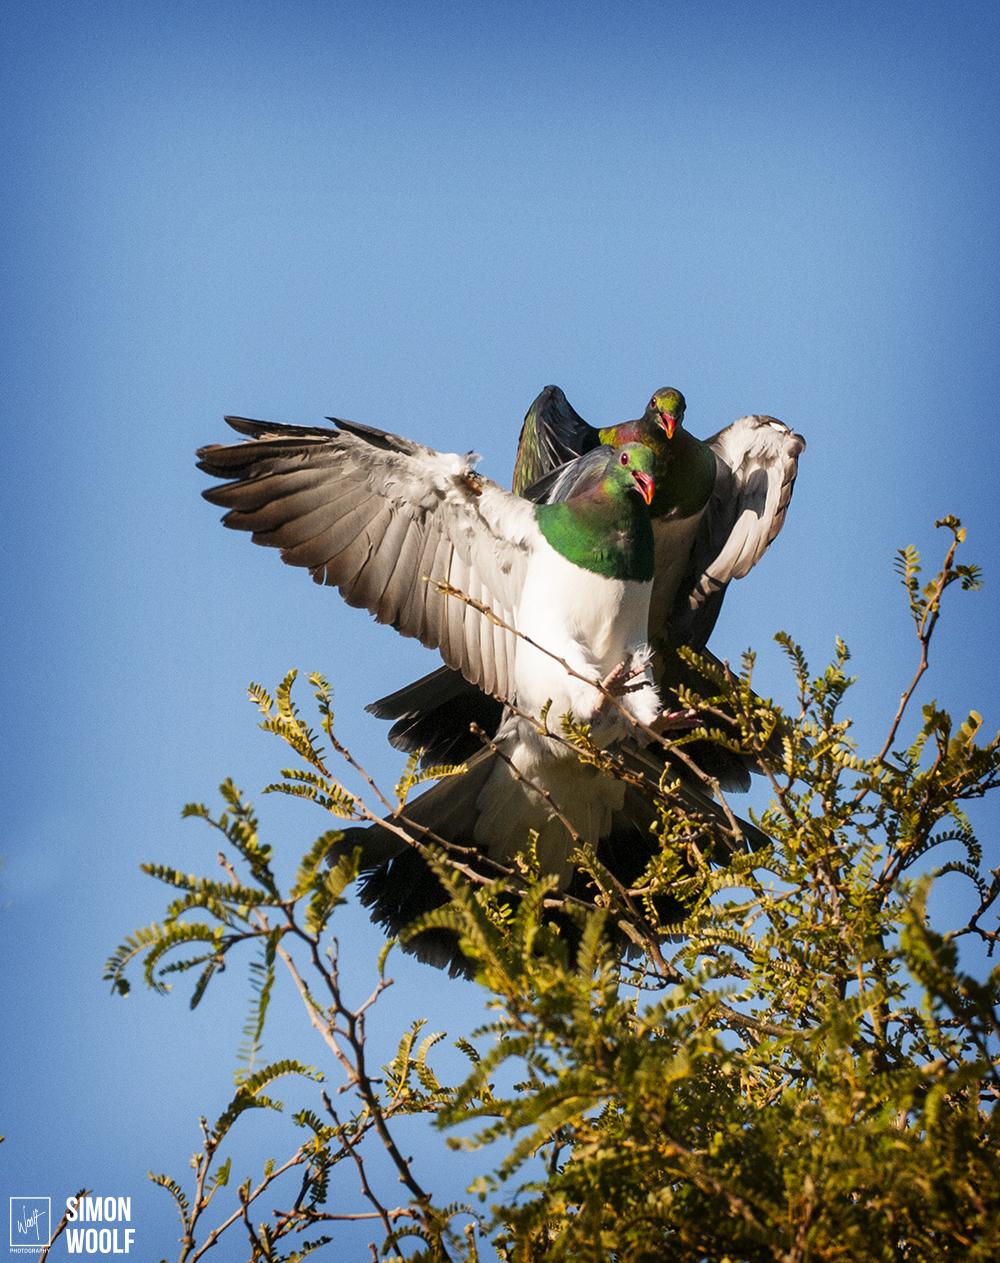 Mating Wood Pigeons_4PW3871.jpg